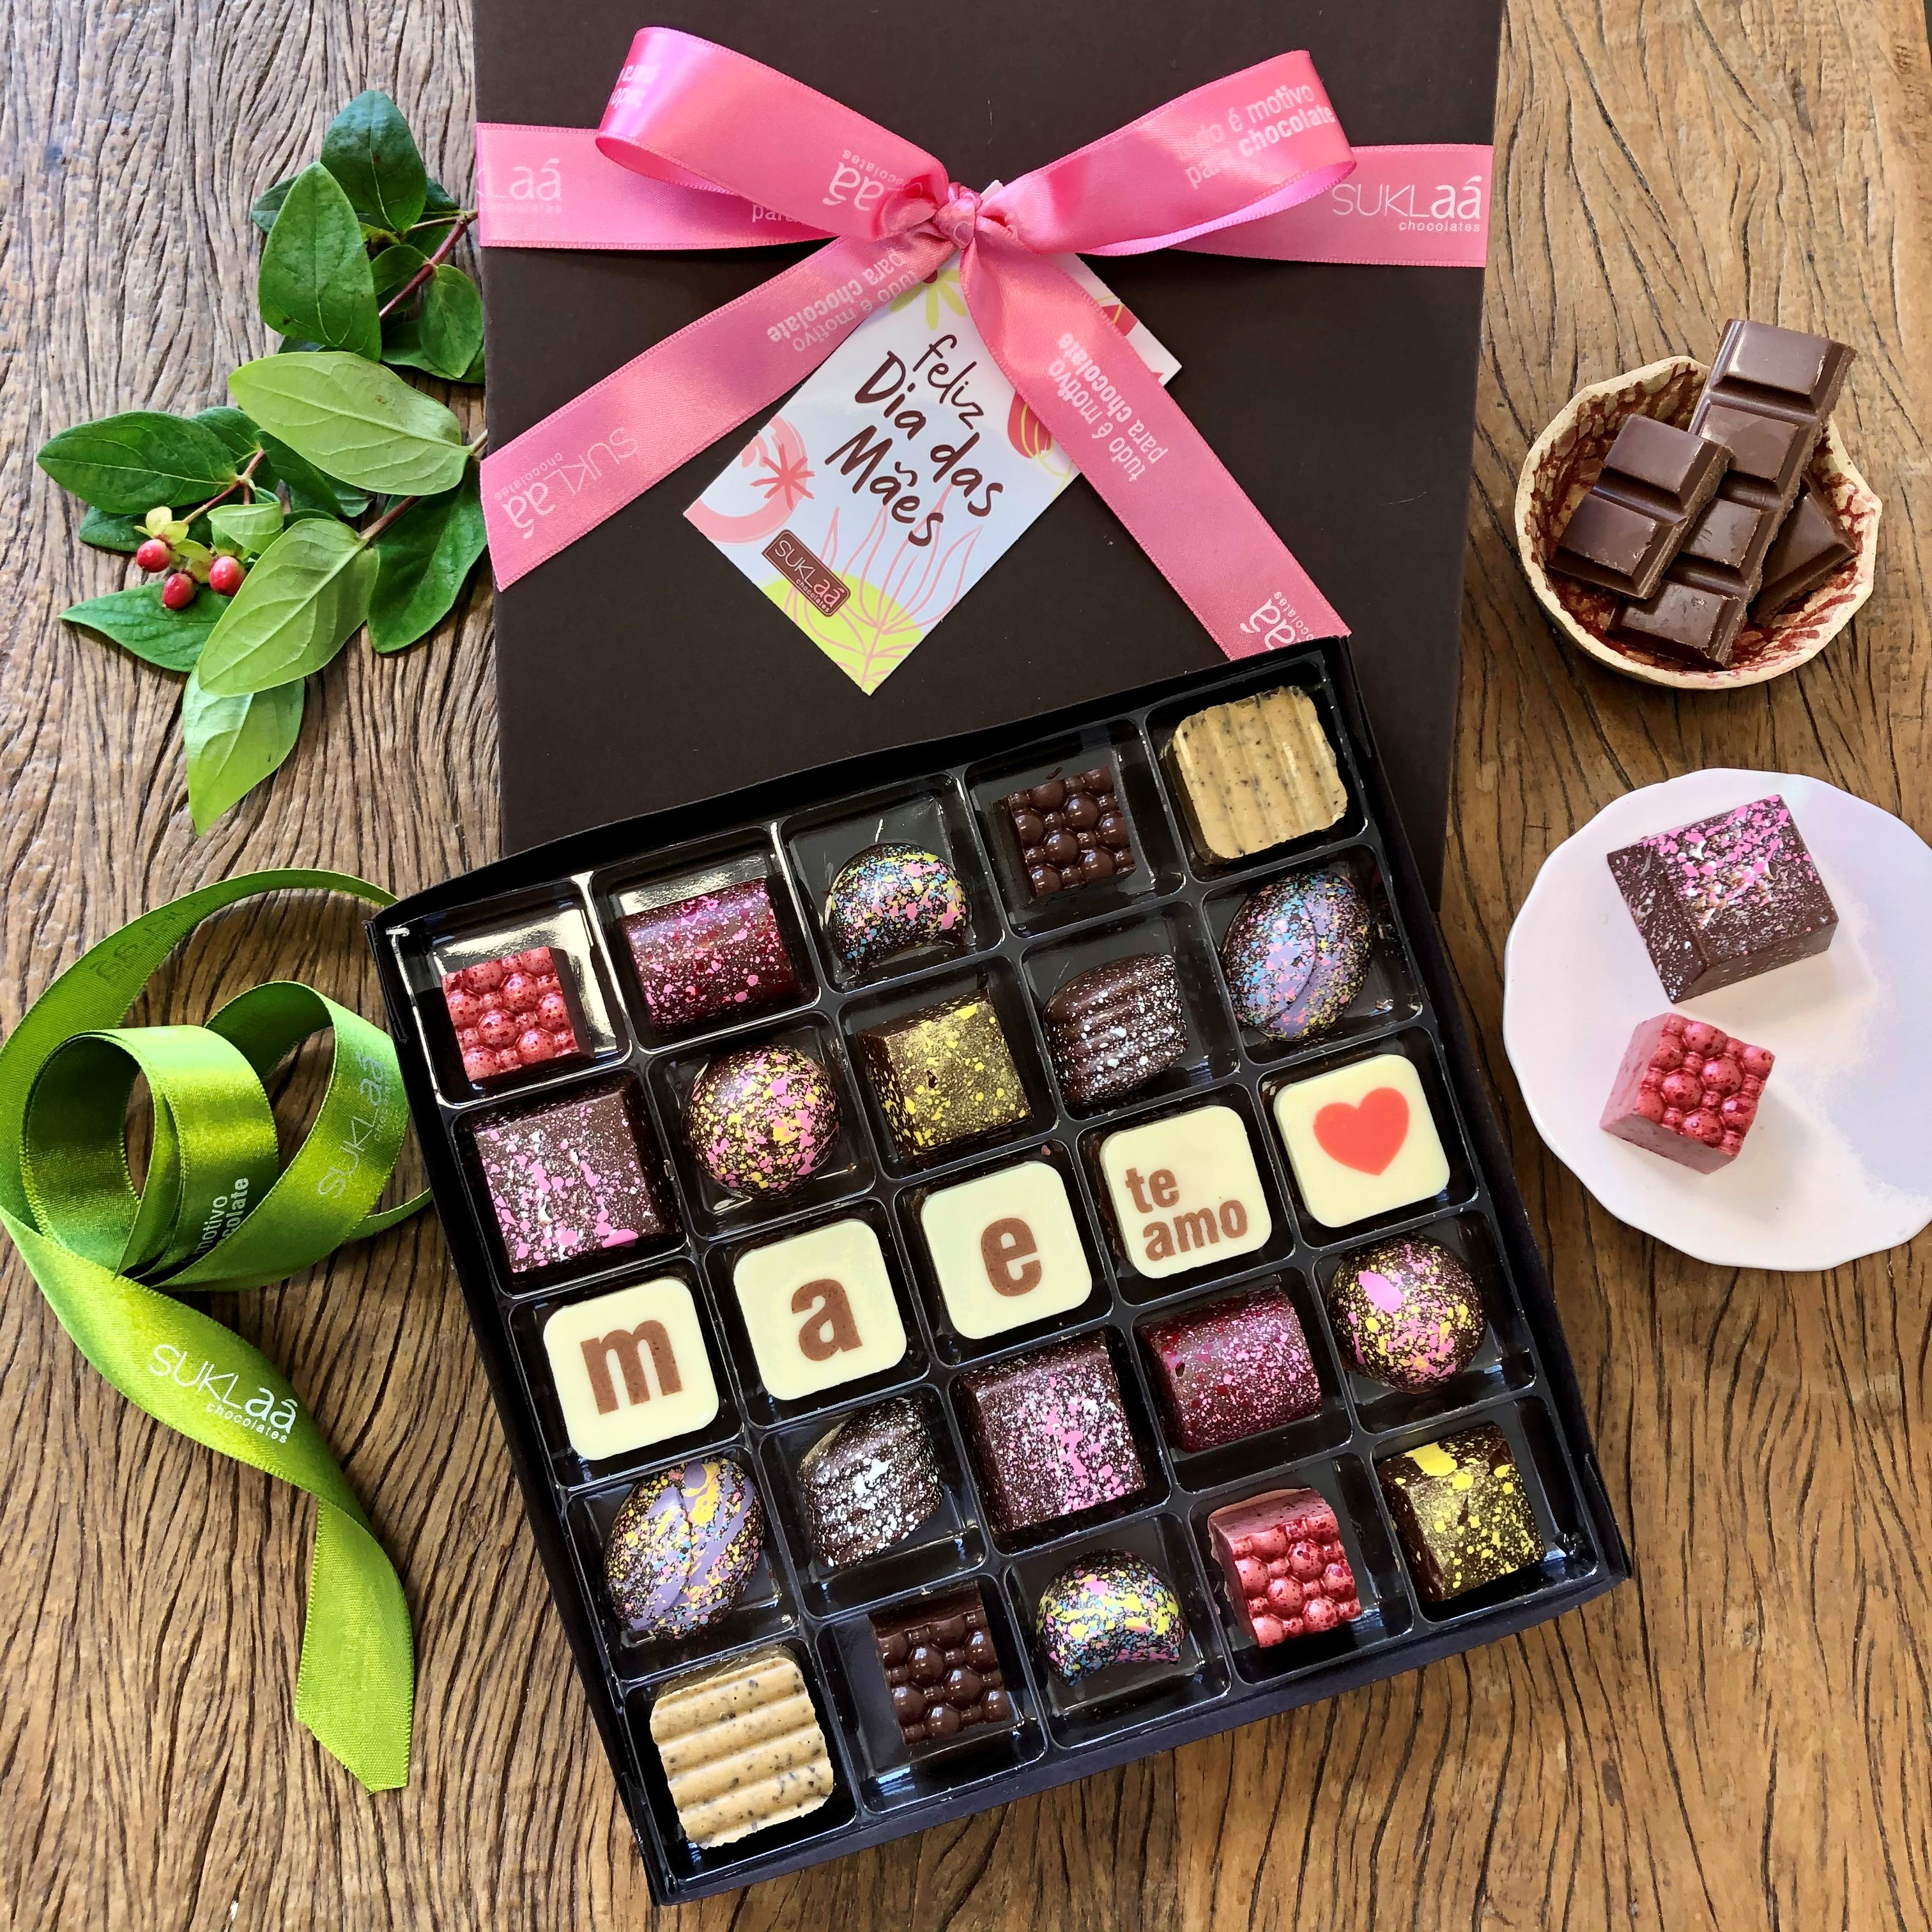 Chocolab 25 bombons - Dia das Mães